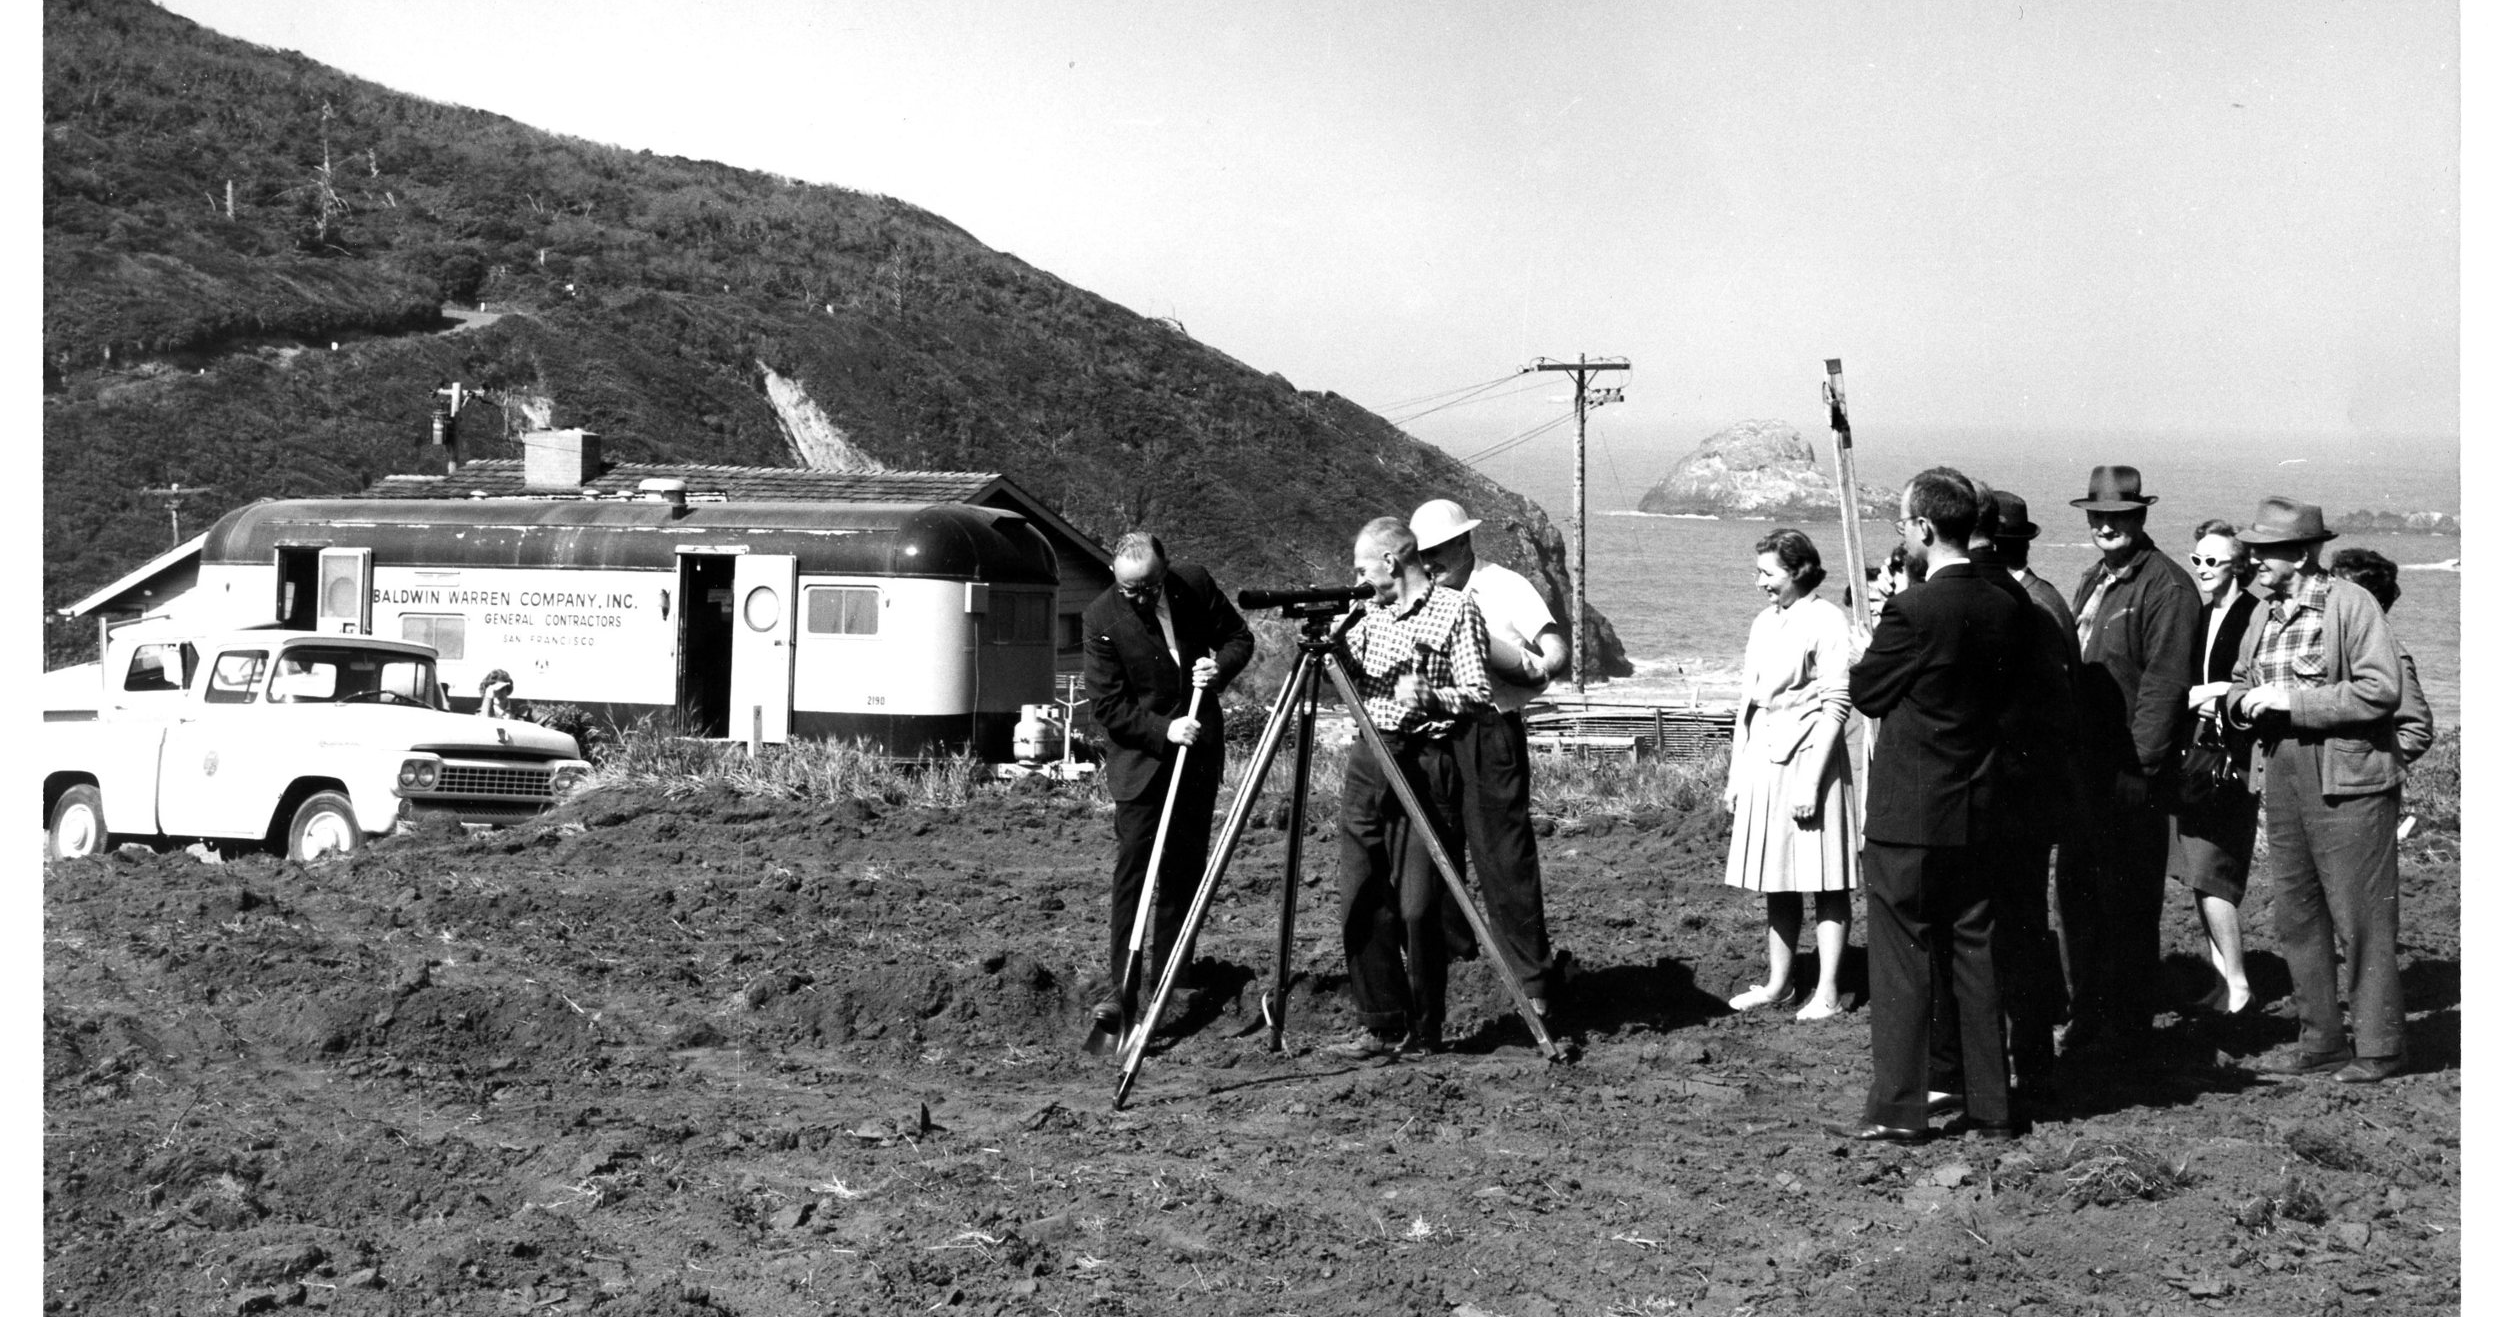 Surveying site for the future marine lab, 1965. Photo: HSU.